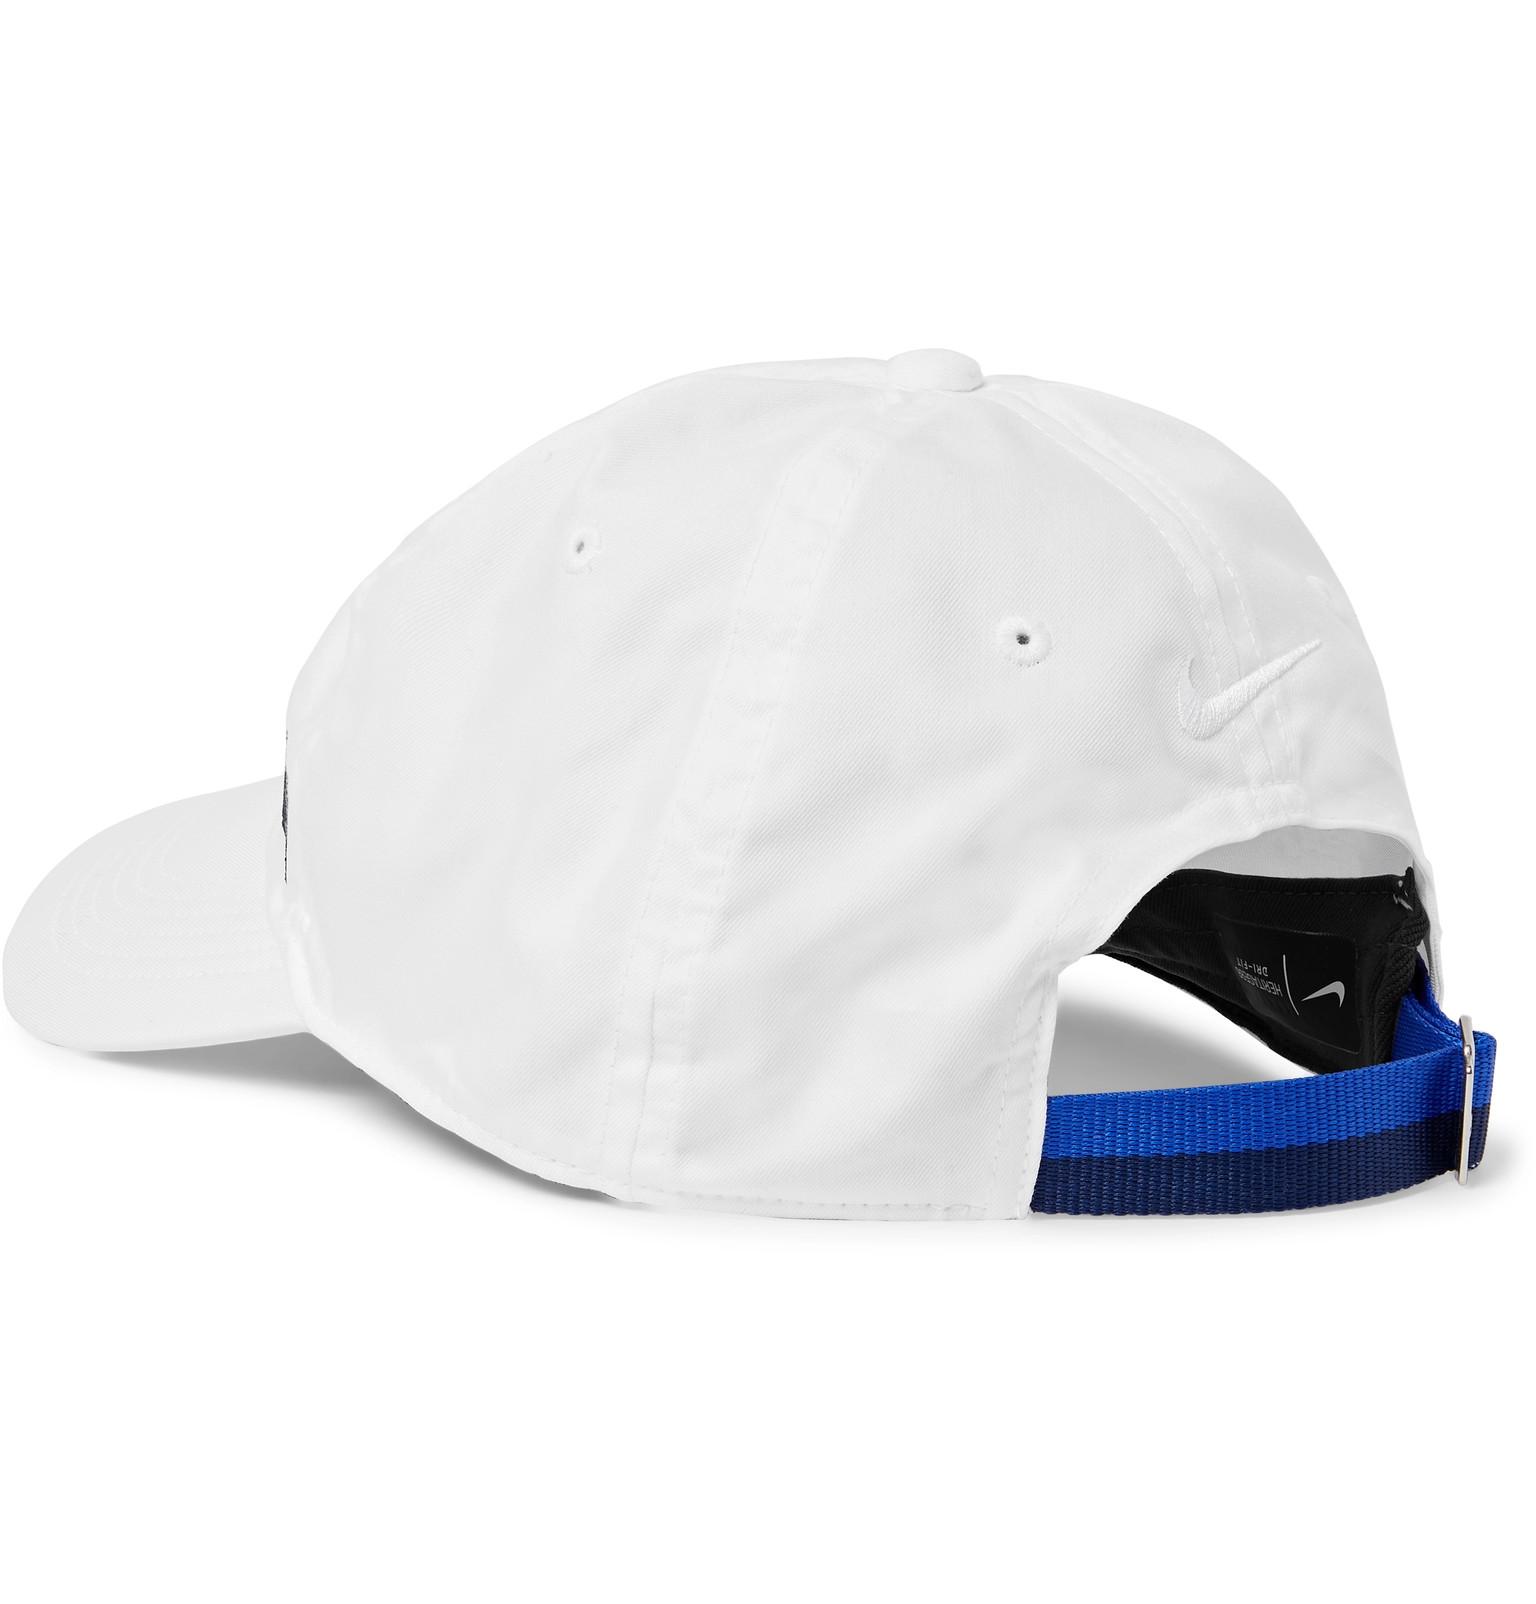 19cd383fa901b Nike Tennis - Roger Federer AeroBill Heritage 86 Dri-FIT Tennis Cap